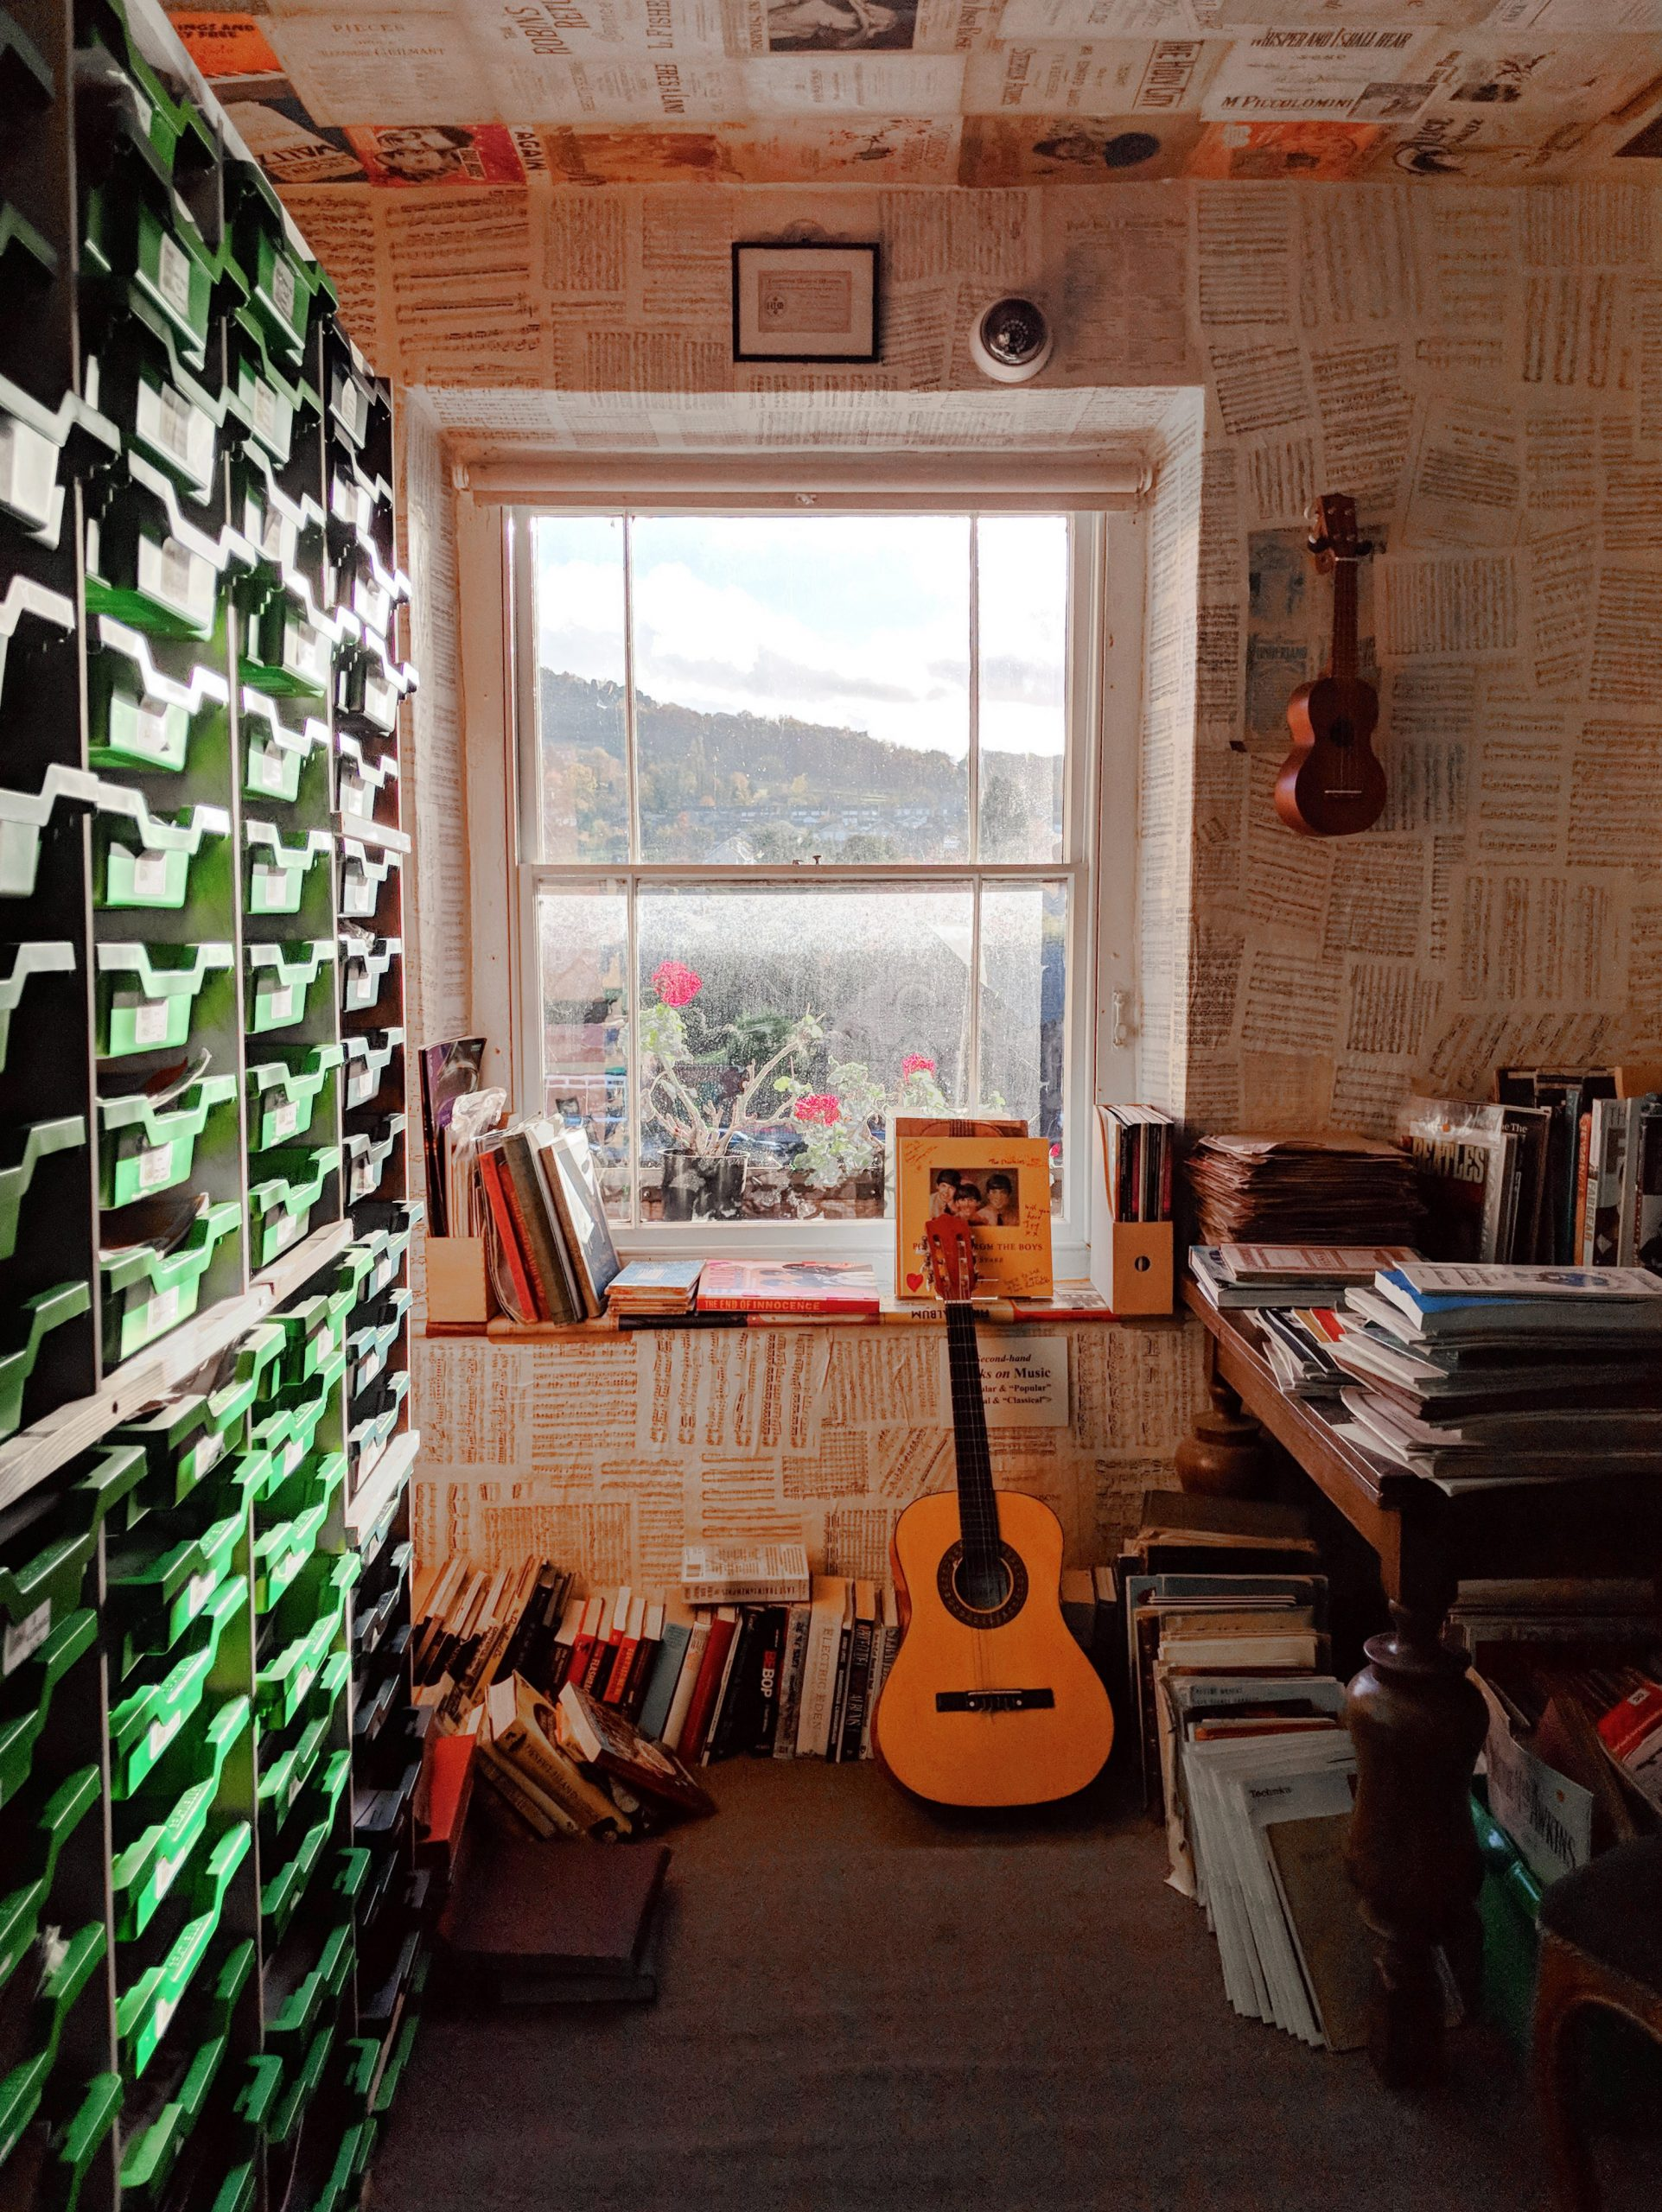 Music Room - Scarthin Books